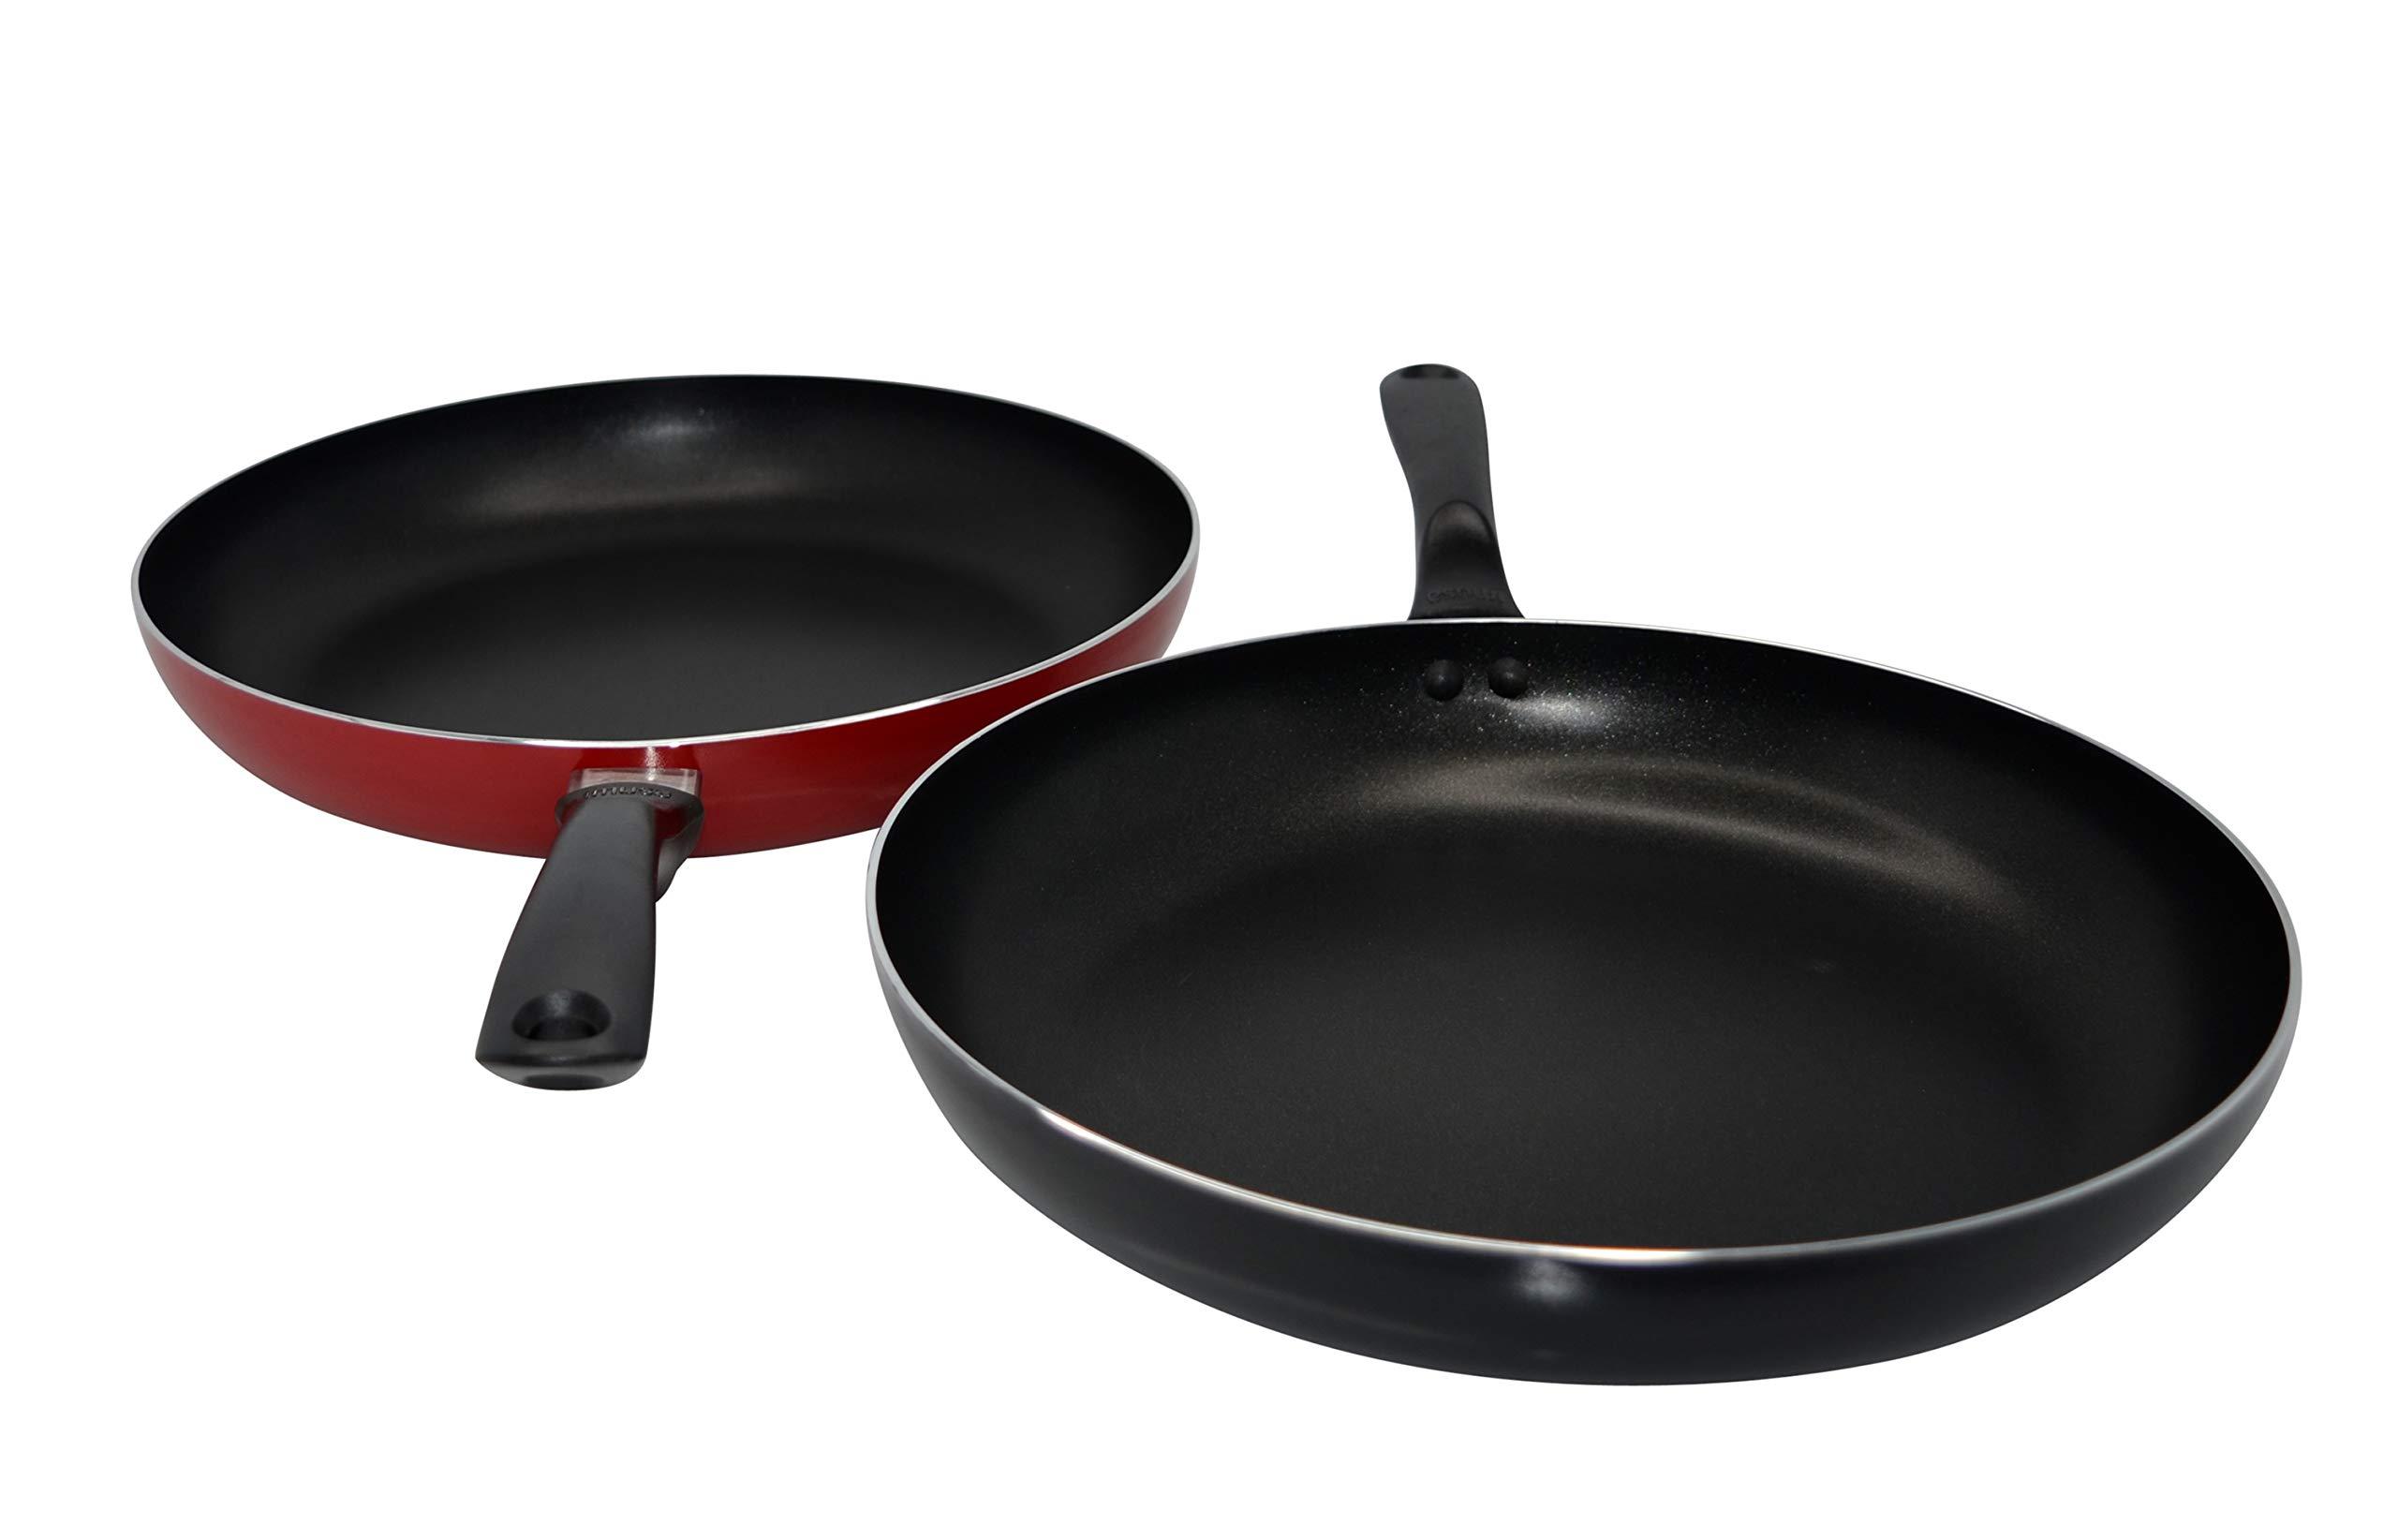 IMUSA USA IMU-01874 Premier Saute Pan 12-Inch, Red or Black by Imusa (Image #1)